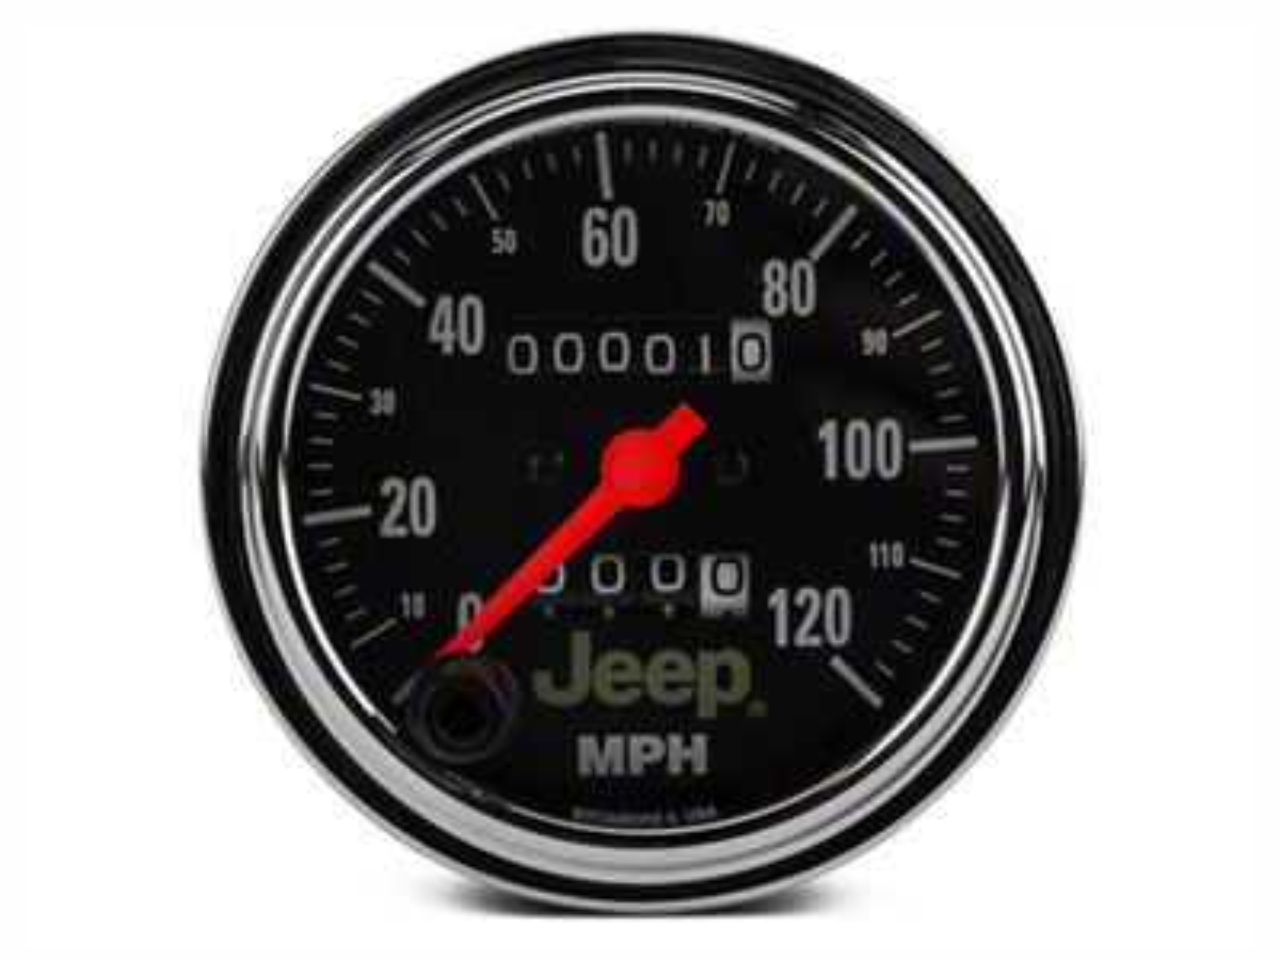 Auto Meter Speedometer Gauge - 0-120 MPH - Mechanical - Jeep Logo (87-18 Jeep Wrangler YJ, TJ, JK & JL)